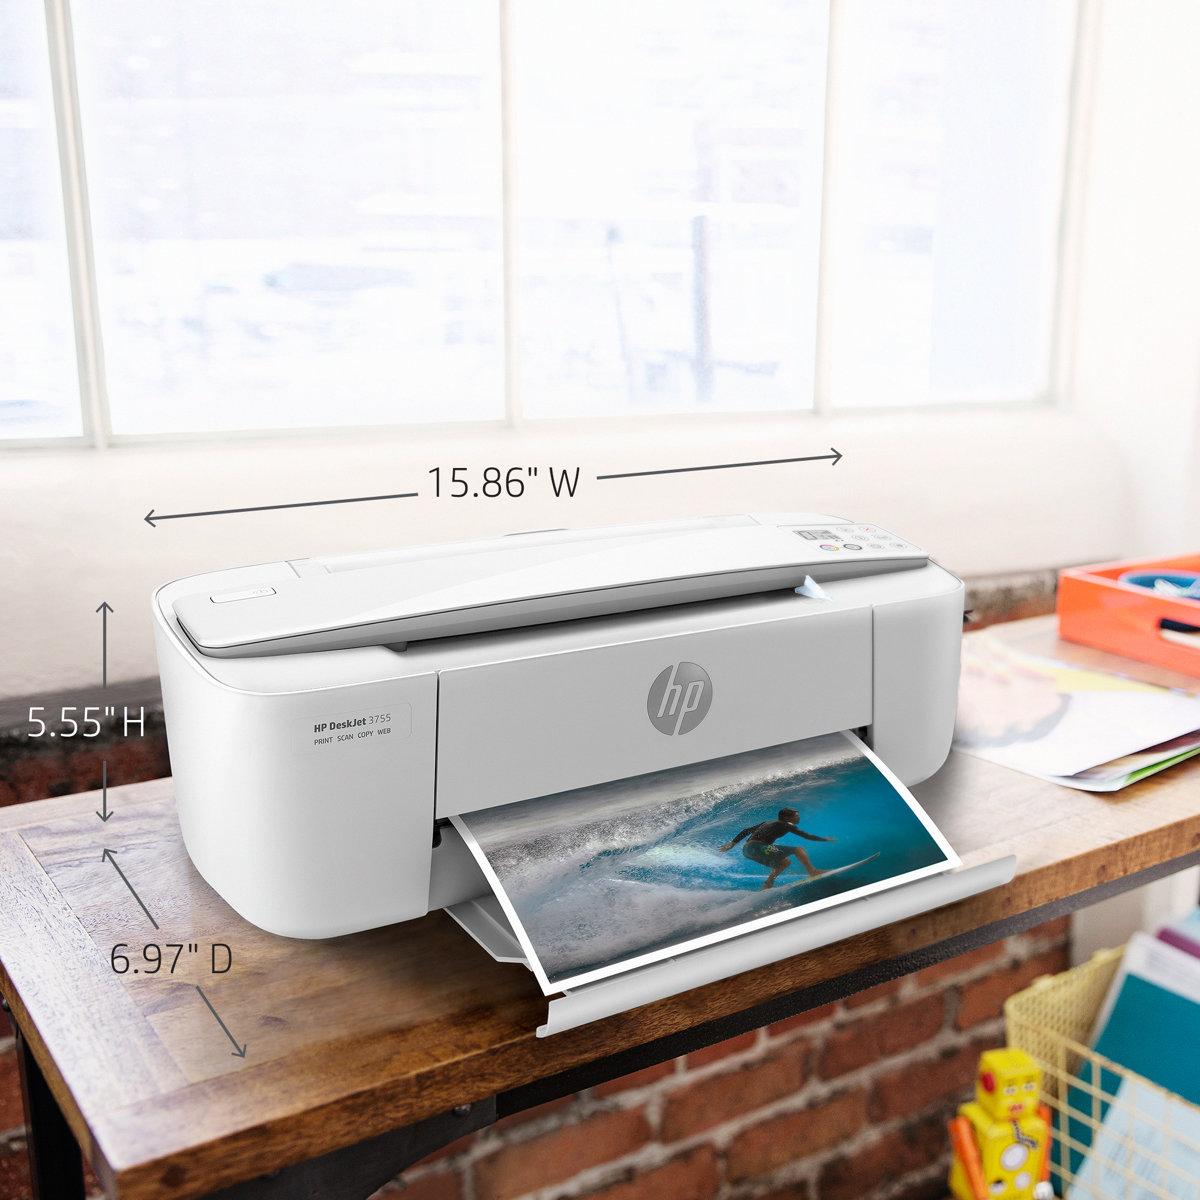 hp deskjet 3520 printer manual ebook rh hp deskjet 3520 printer manual ebook angelayu us